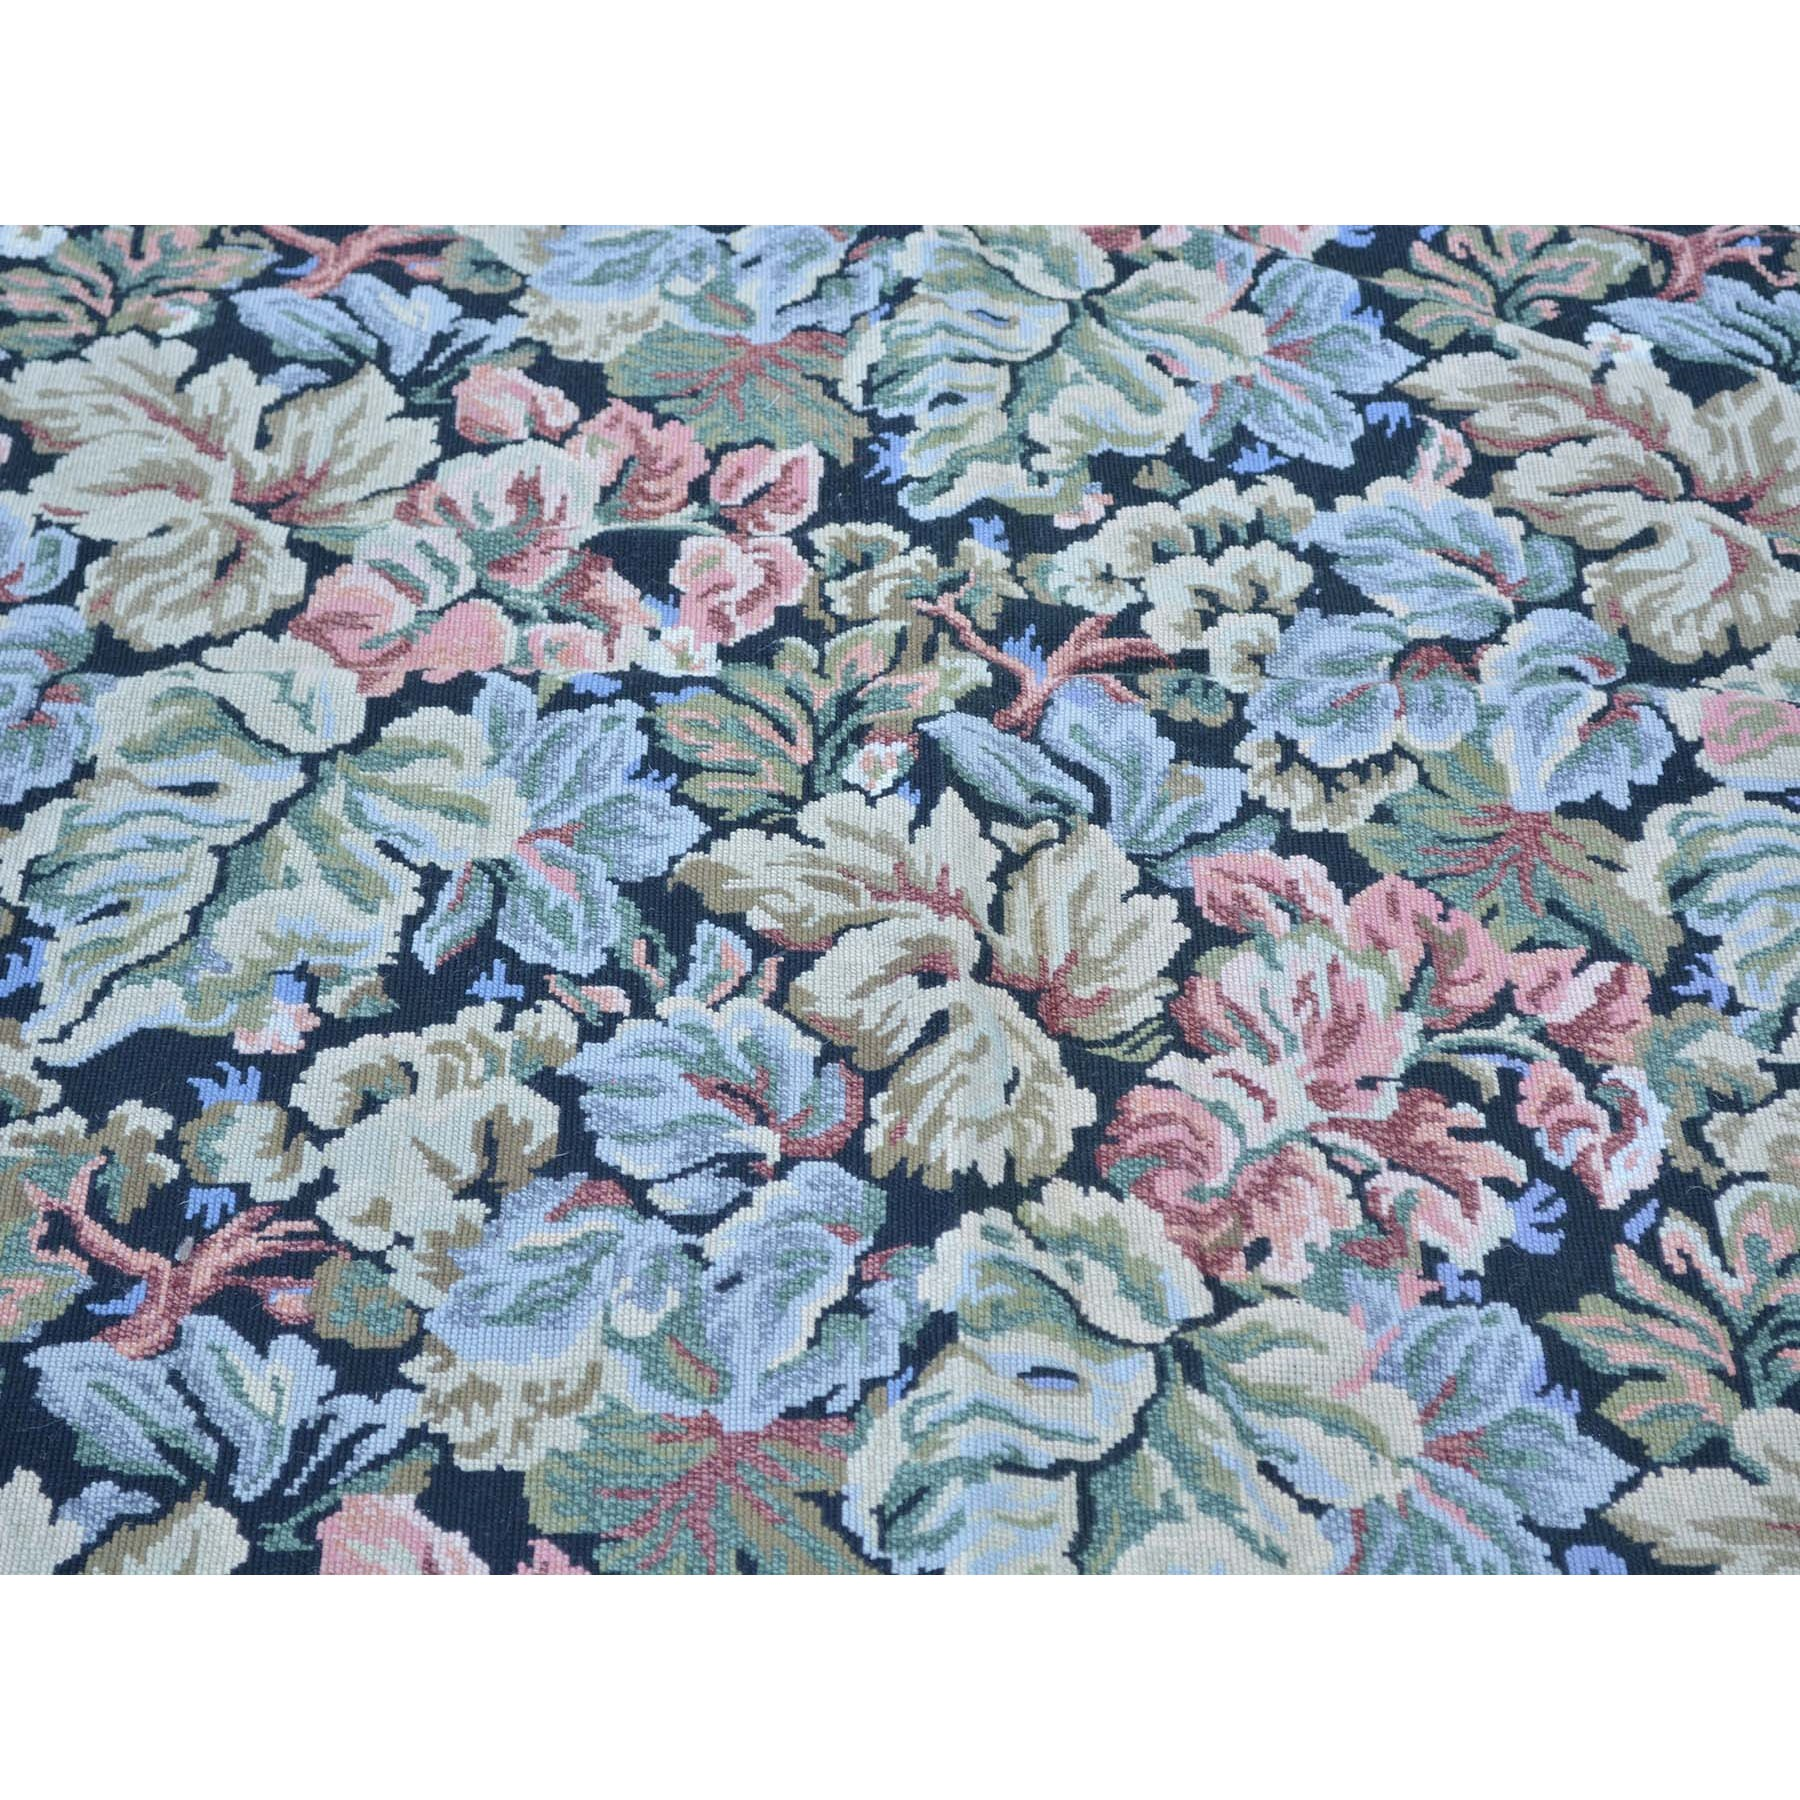 5-9 x8-9  Needlepoint Hand Stitched Botanical Design Pure Wool Rug